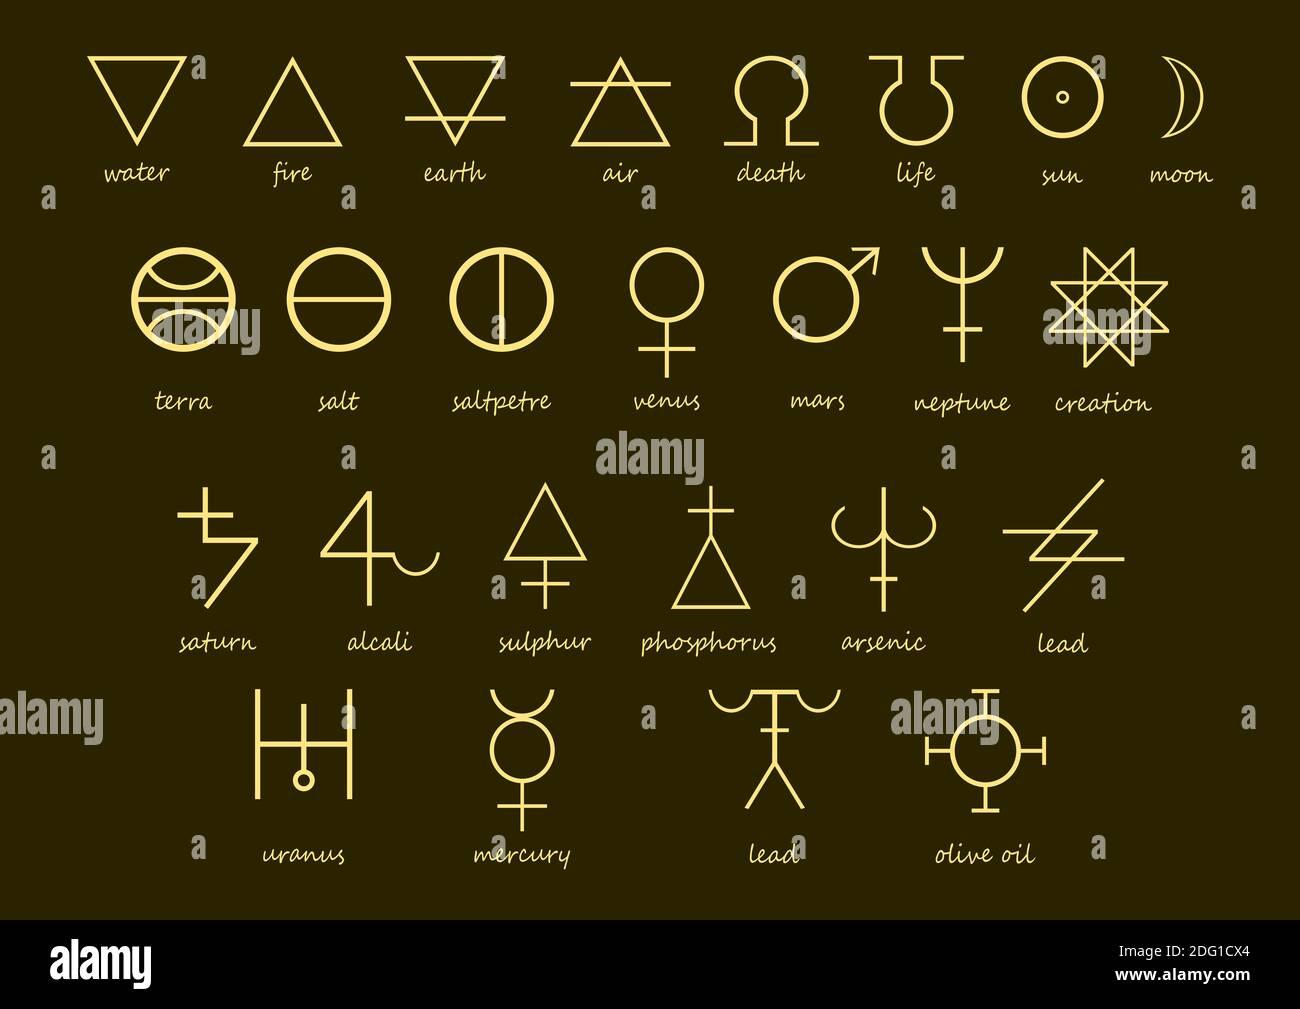 Alchemy Symbols Stockfotos und  bilder Kaufen   Alamy